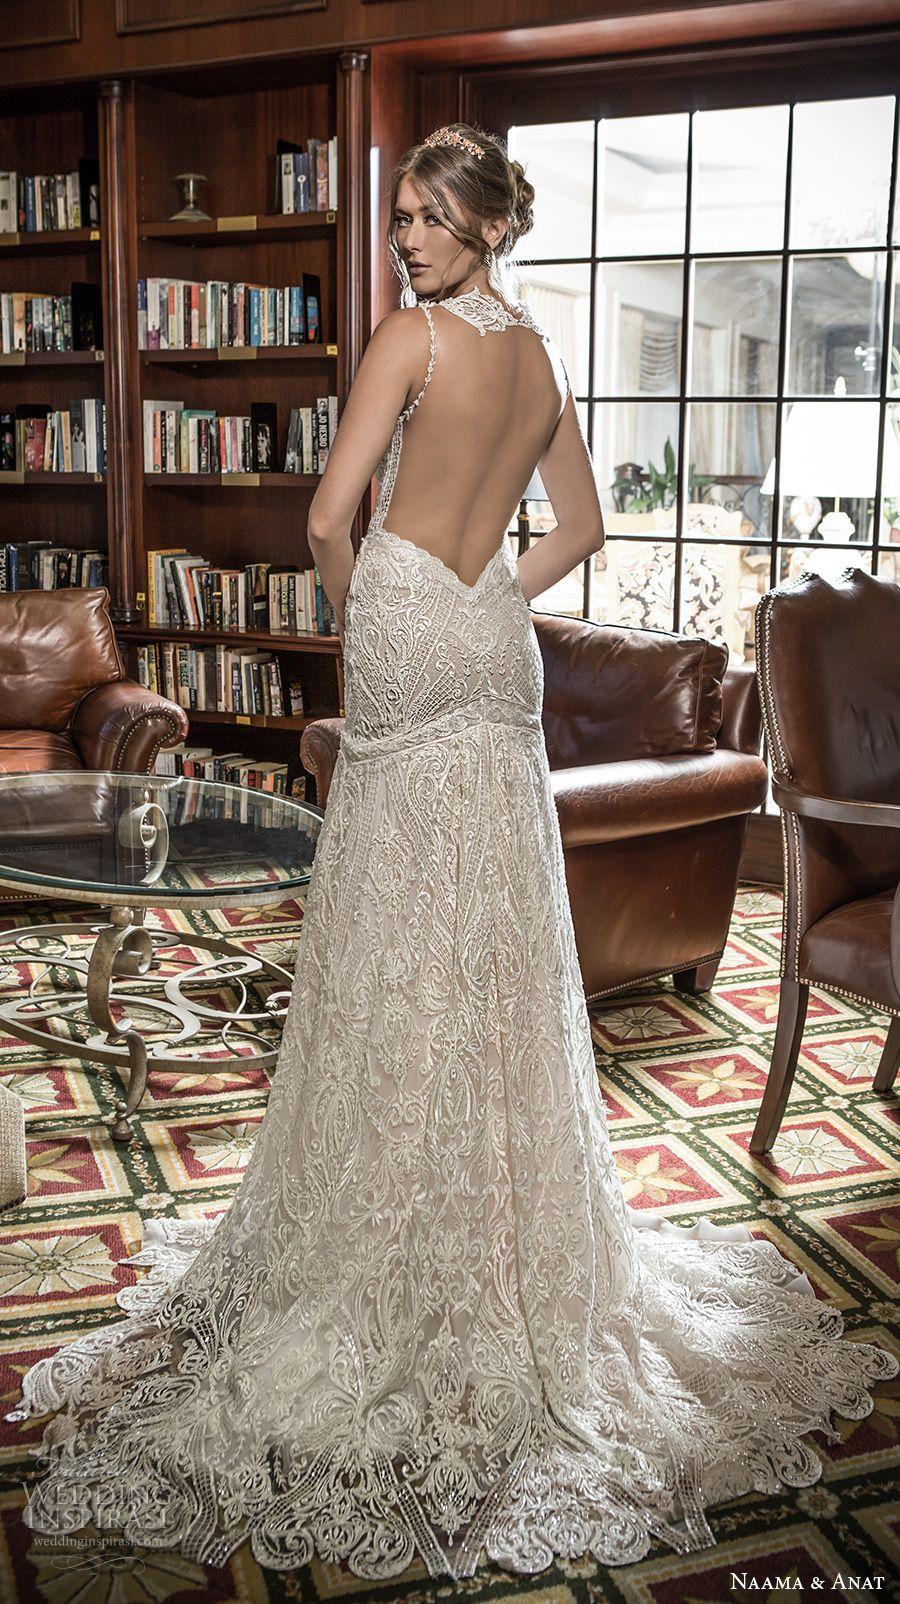 Naama u anat wedding dresses u ucthe star in youud bridal